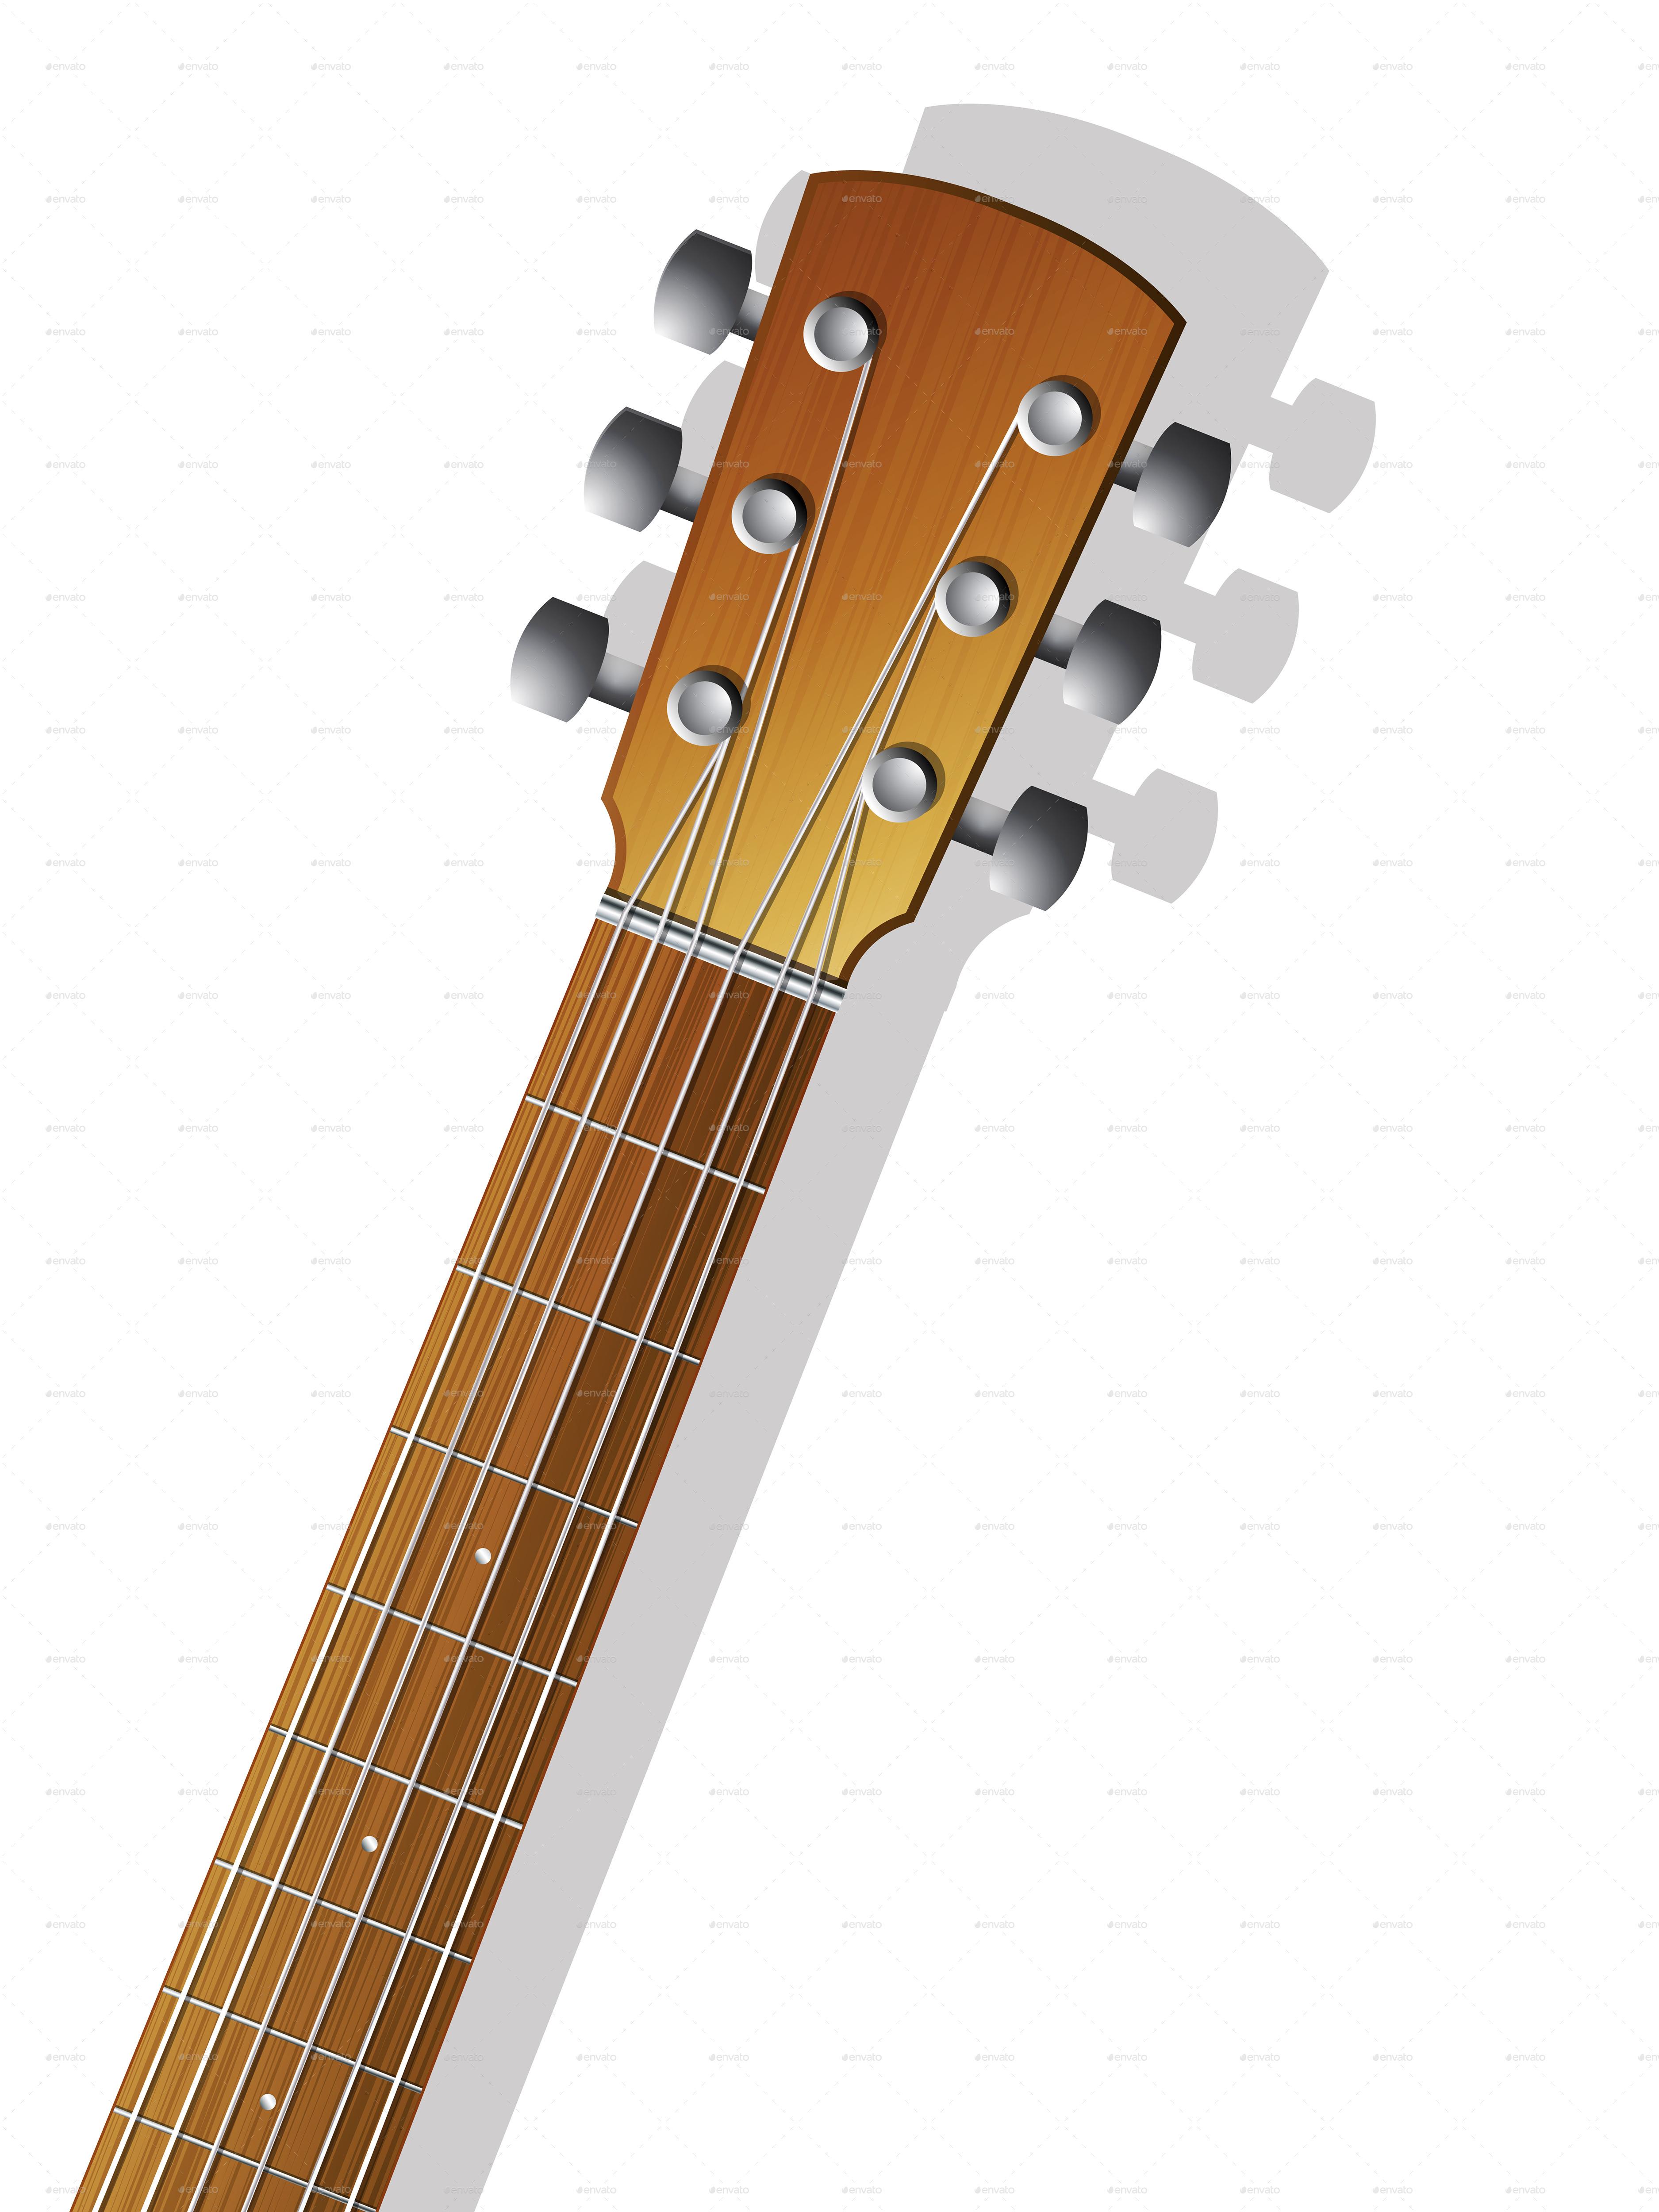 Guitar neck photo